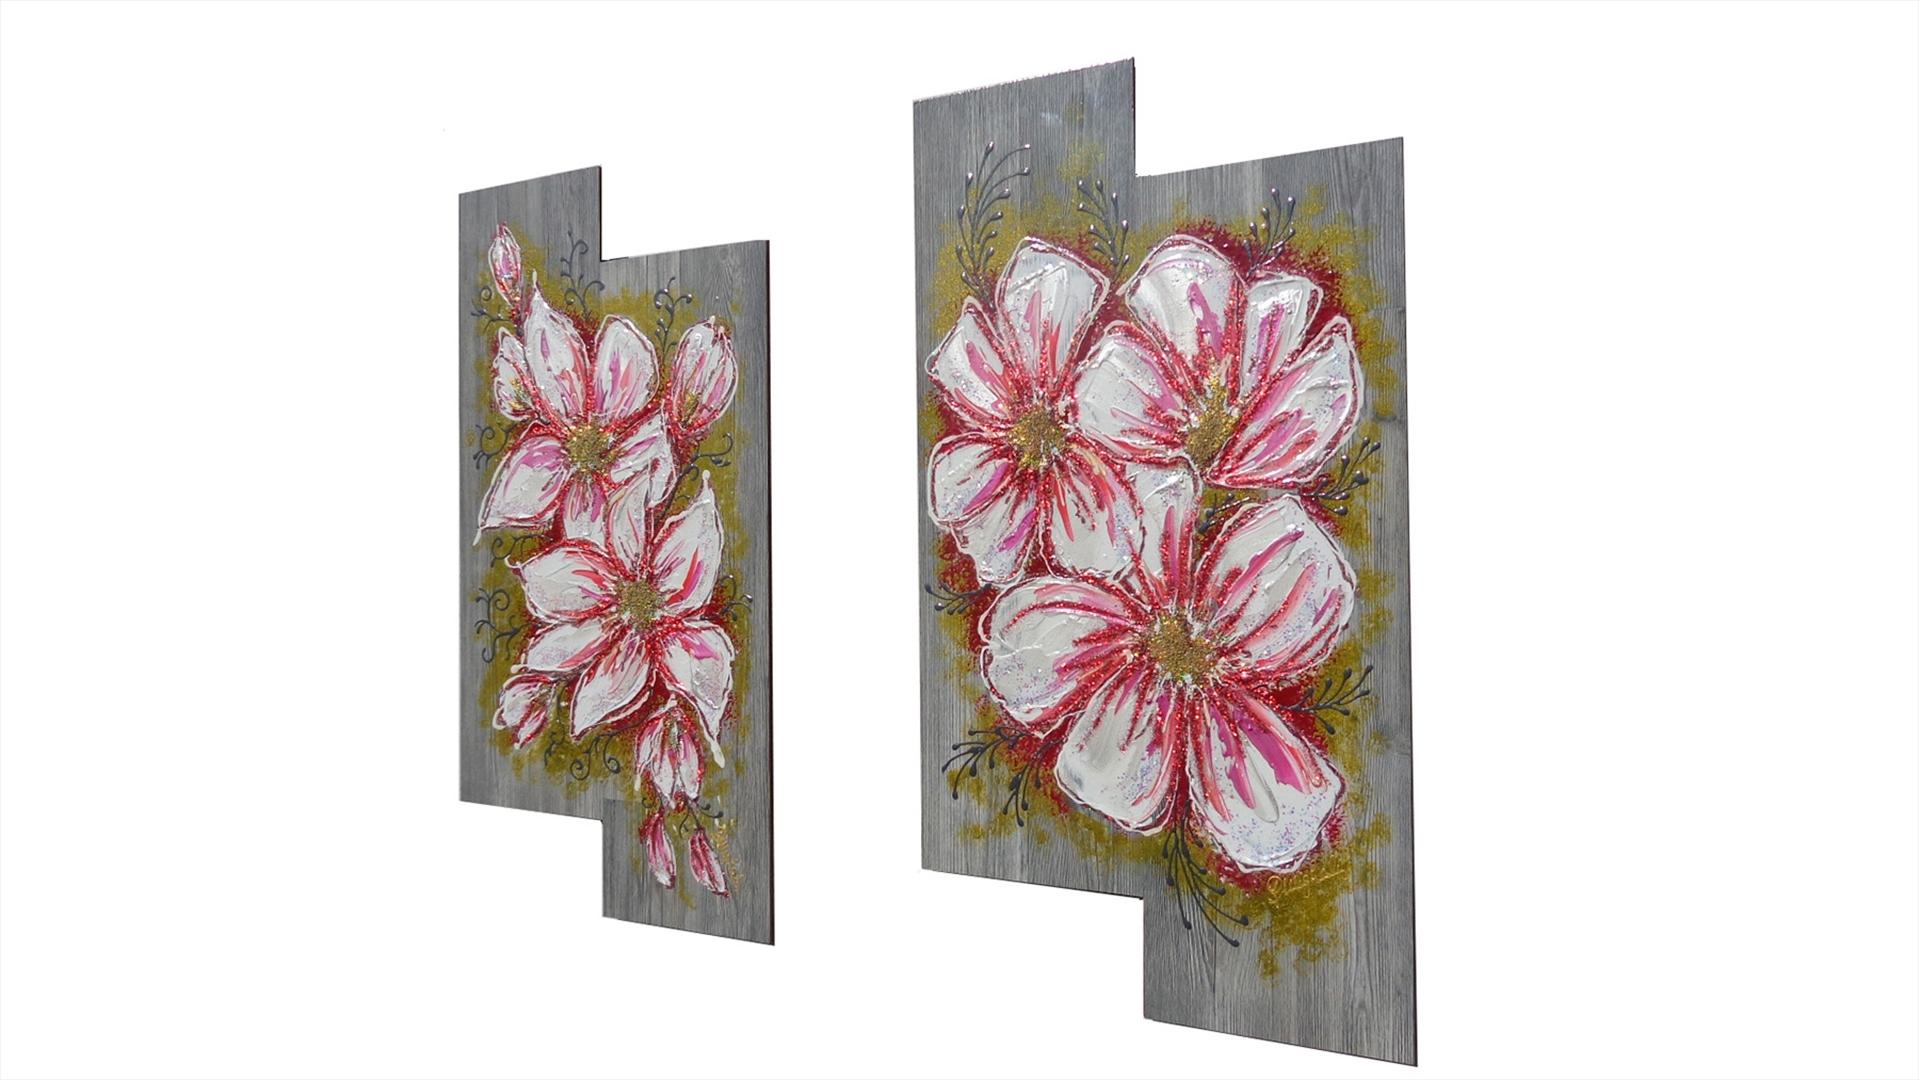 Fiori bianchi moderni vendita quadri online quadri for Quadri moderni vendita